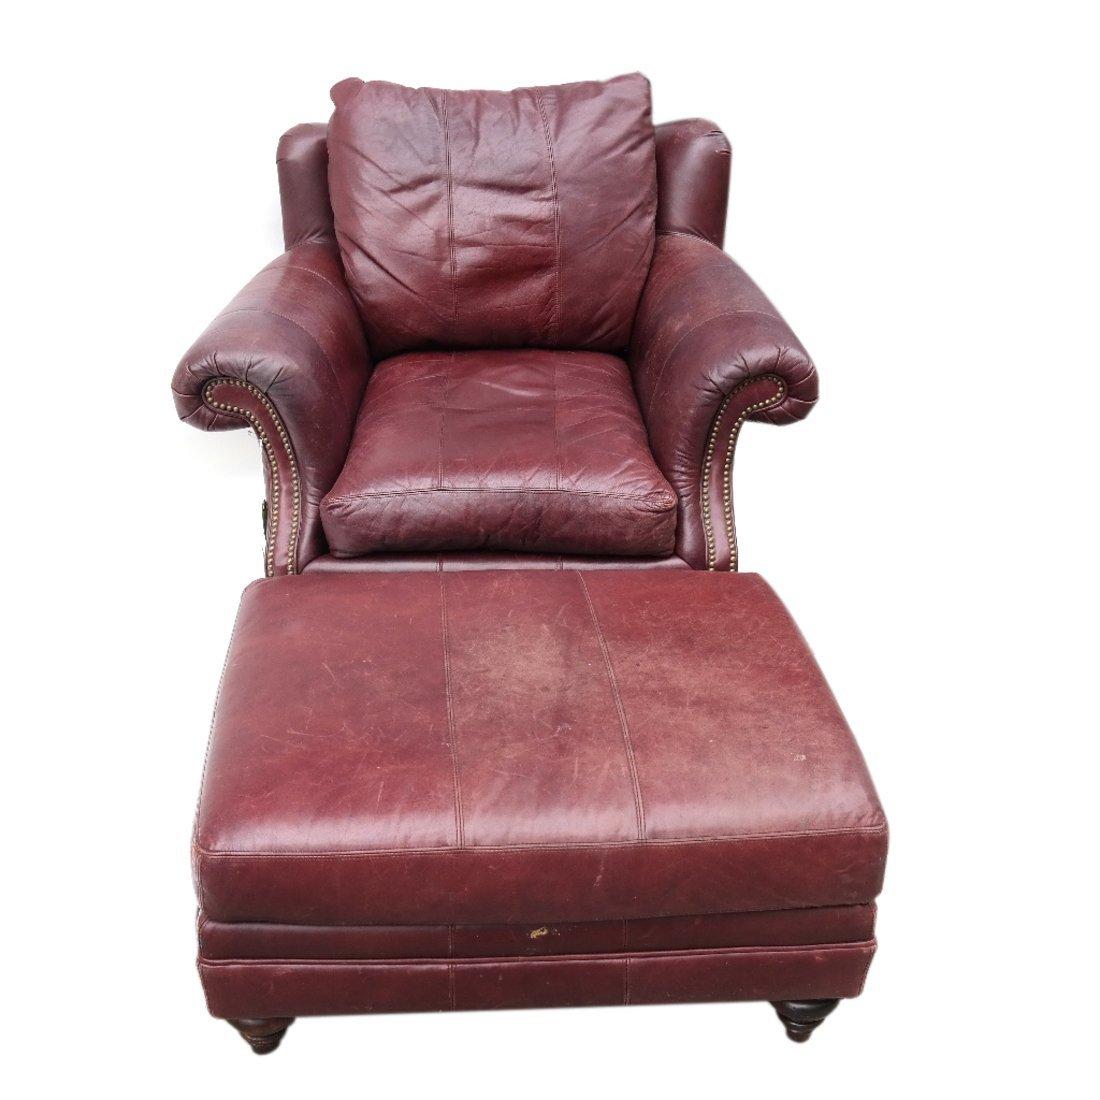 Burgundy Club Chair & Ottoman - 9